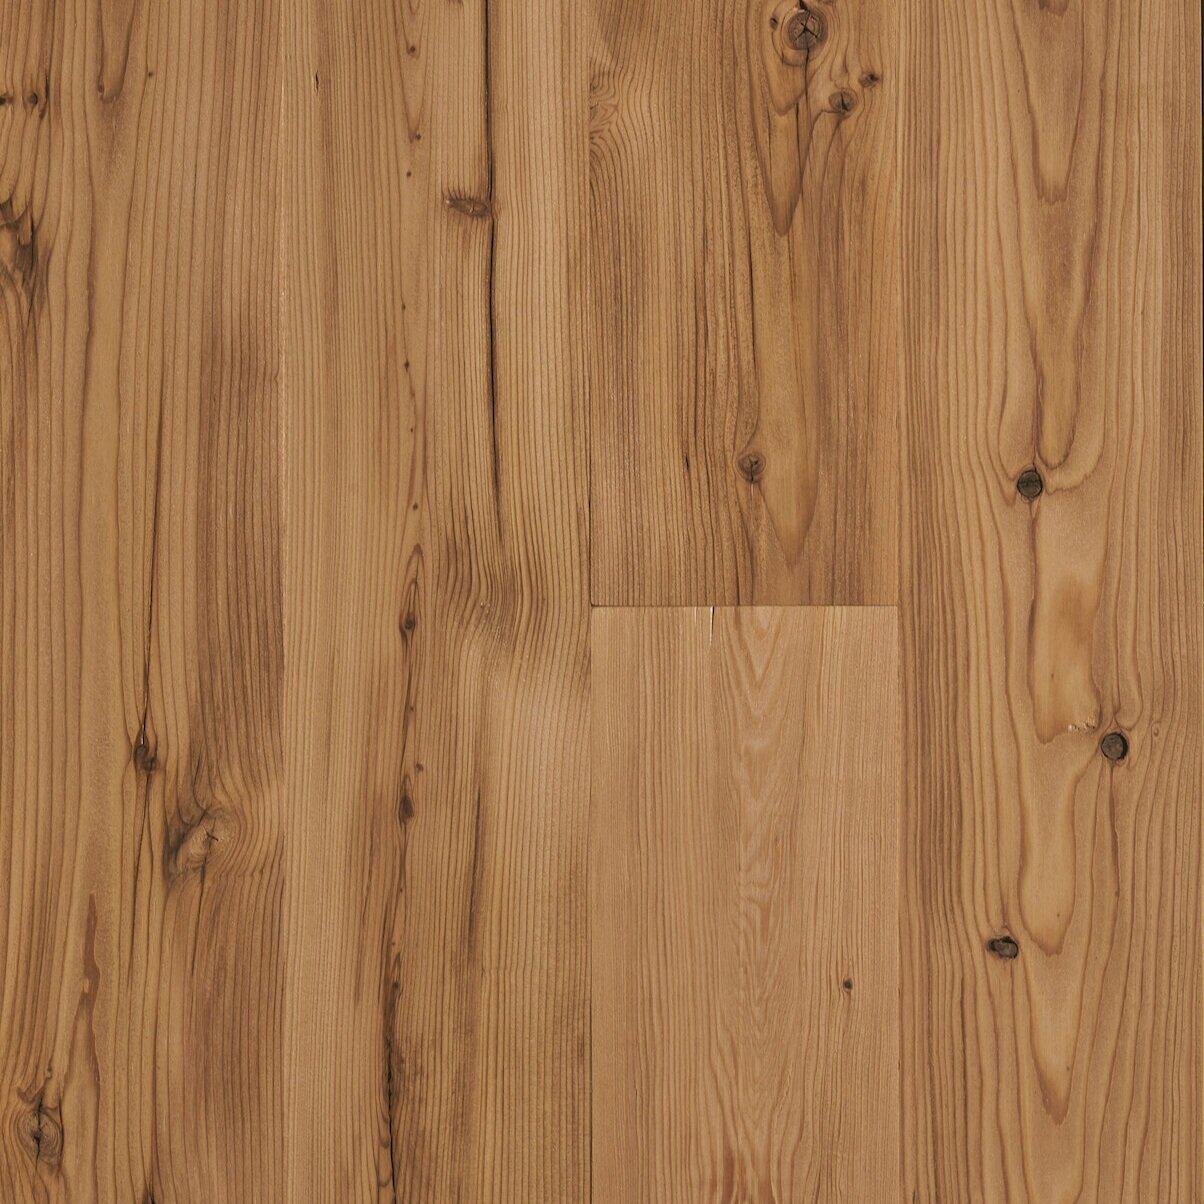 Reclaimed Flooring Blog